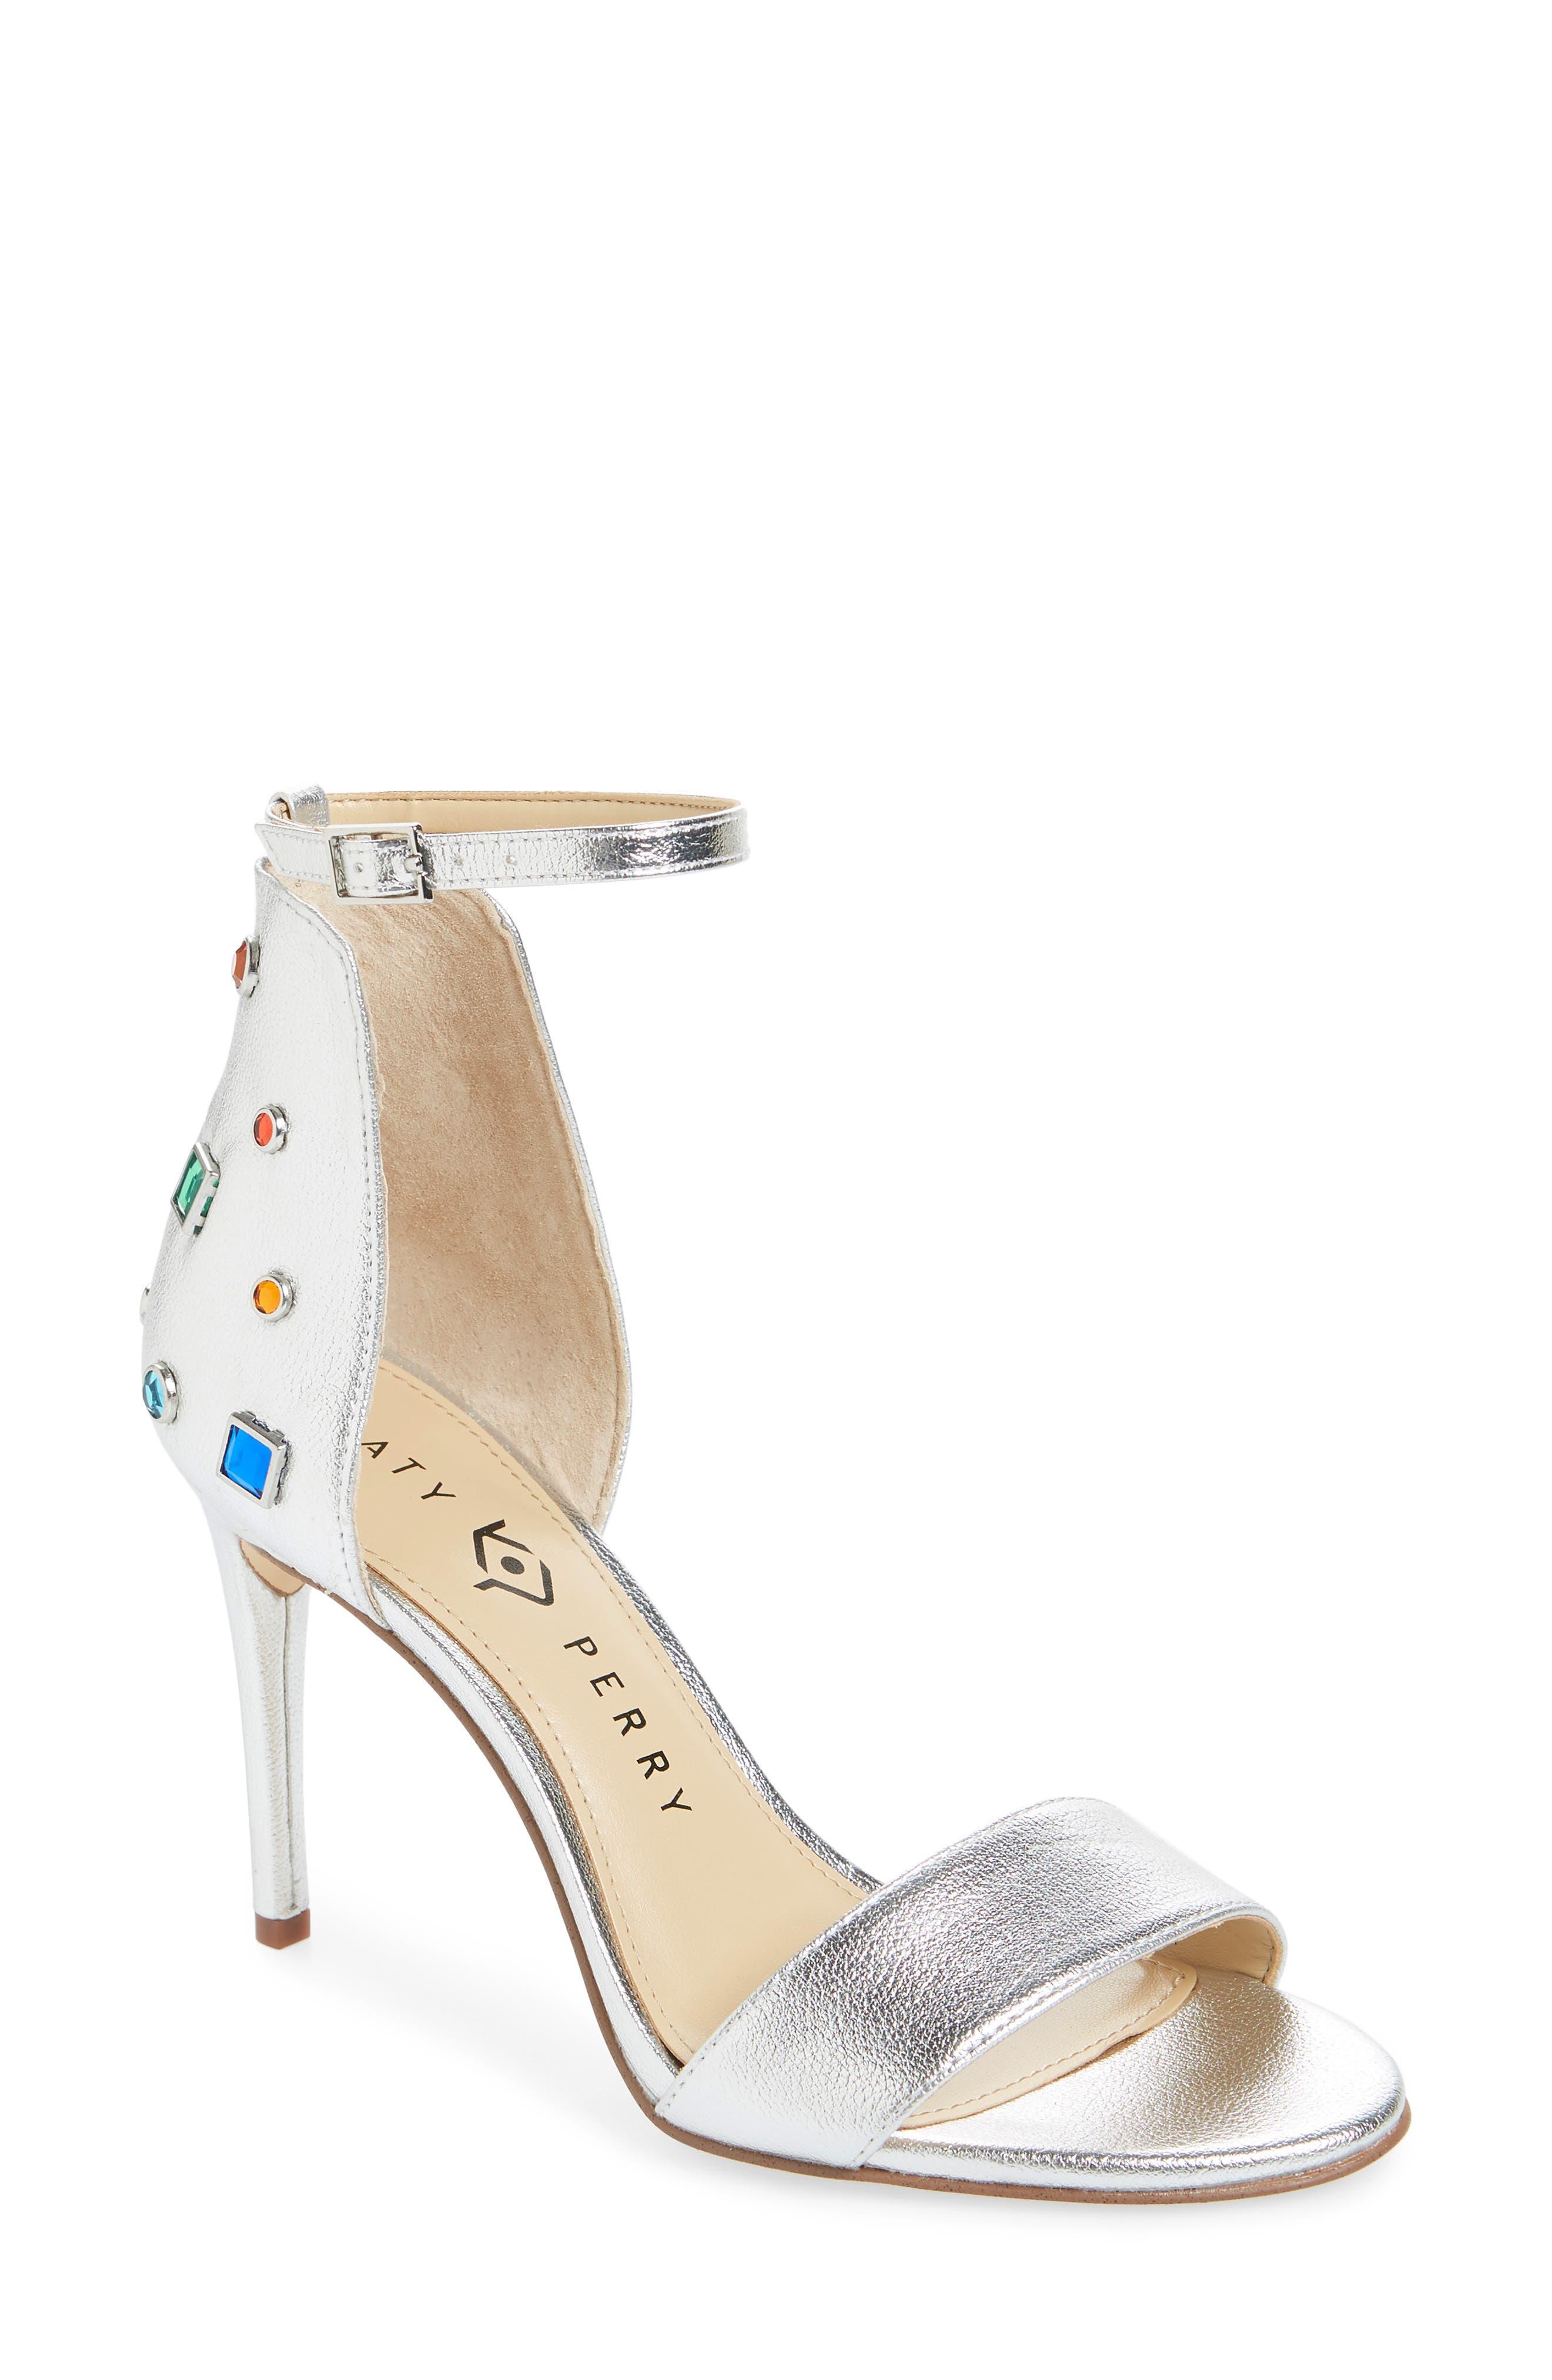 Jewel Ankle Strap Sandal in Silver